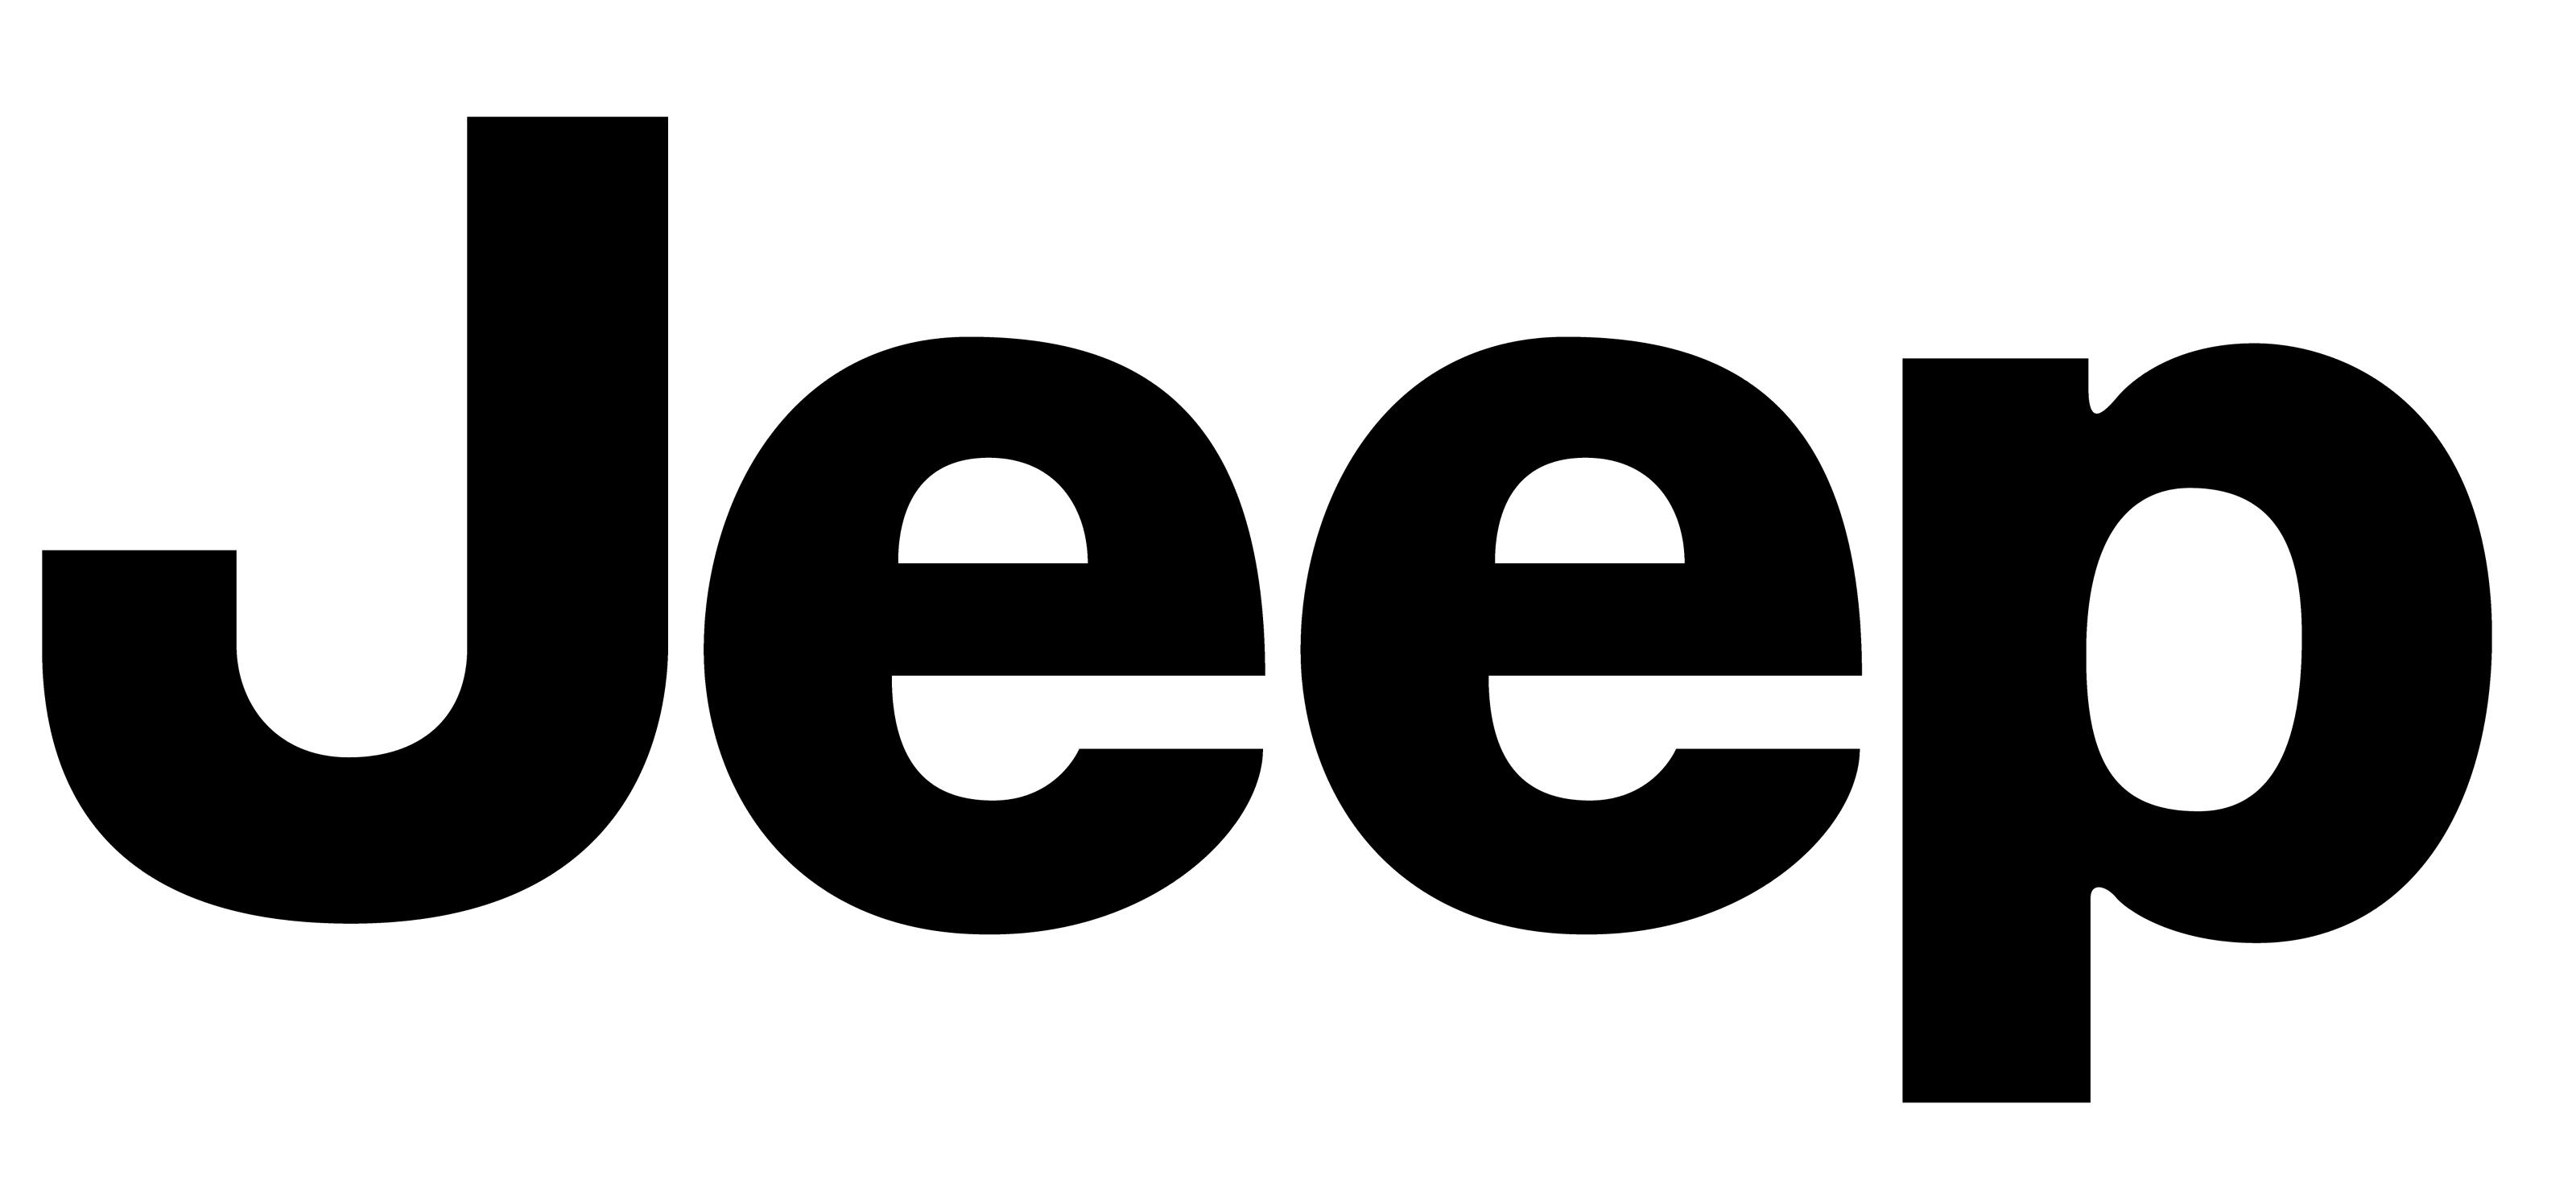 Jeep logo clip art cliparts for Logo clipart